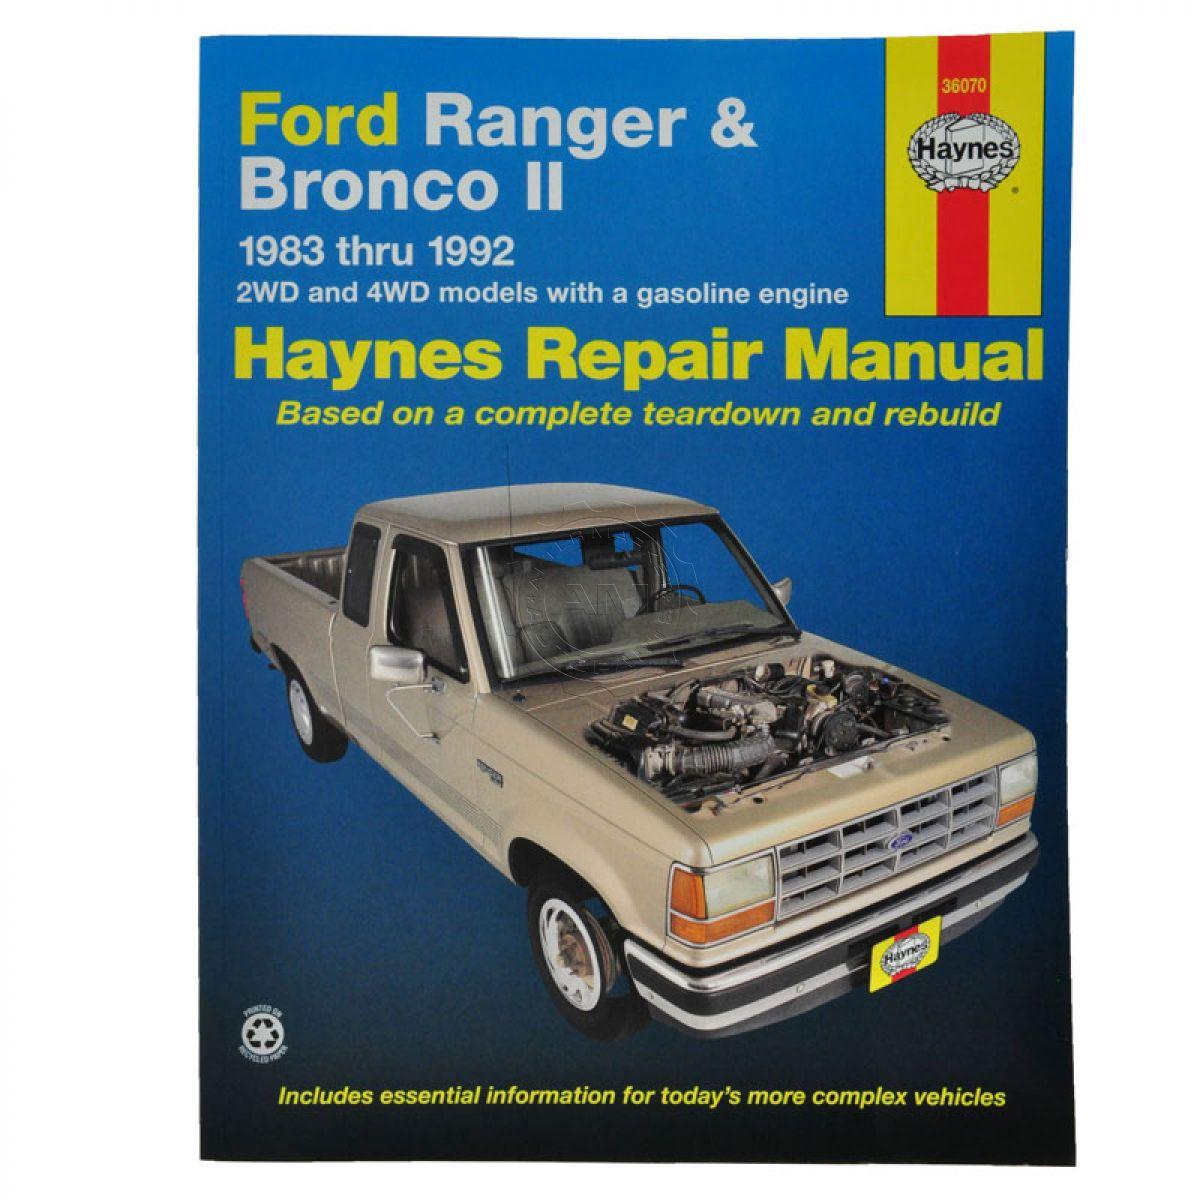 Ford Service Manuals: Haynes Repair Manual For 83 90 91 92 Ford Ranger Bronco II